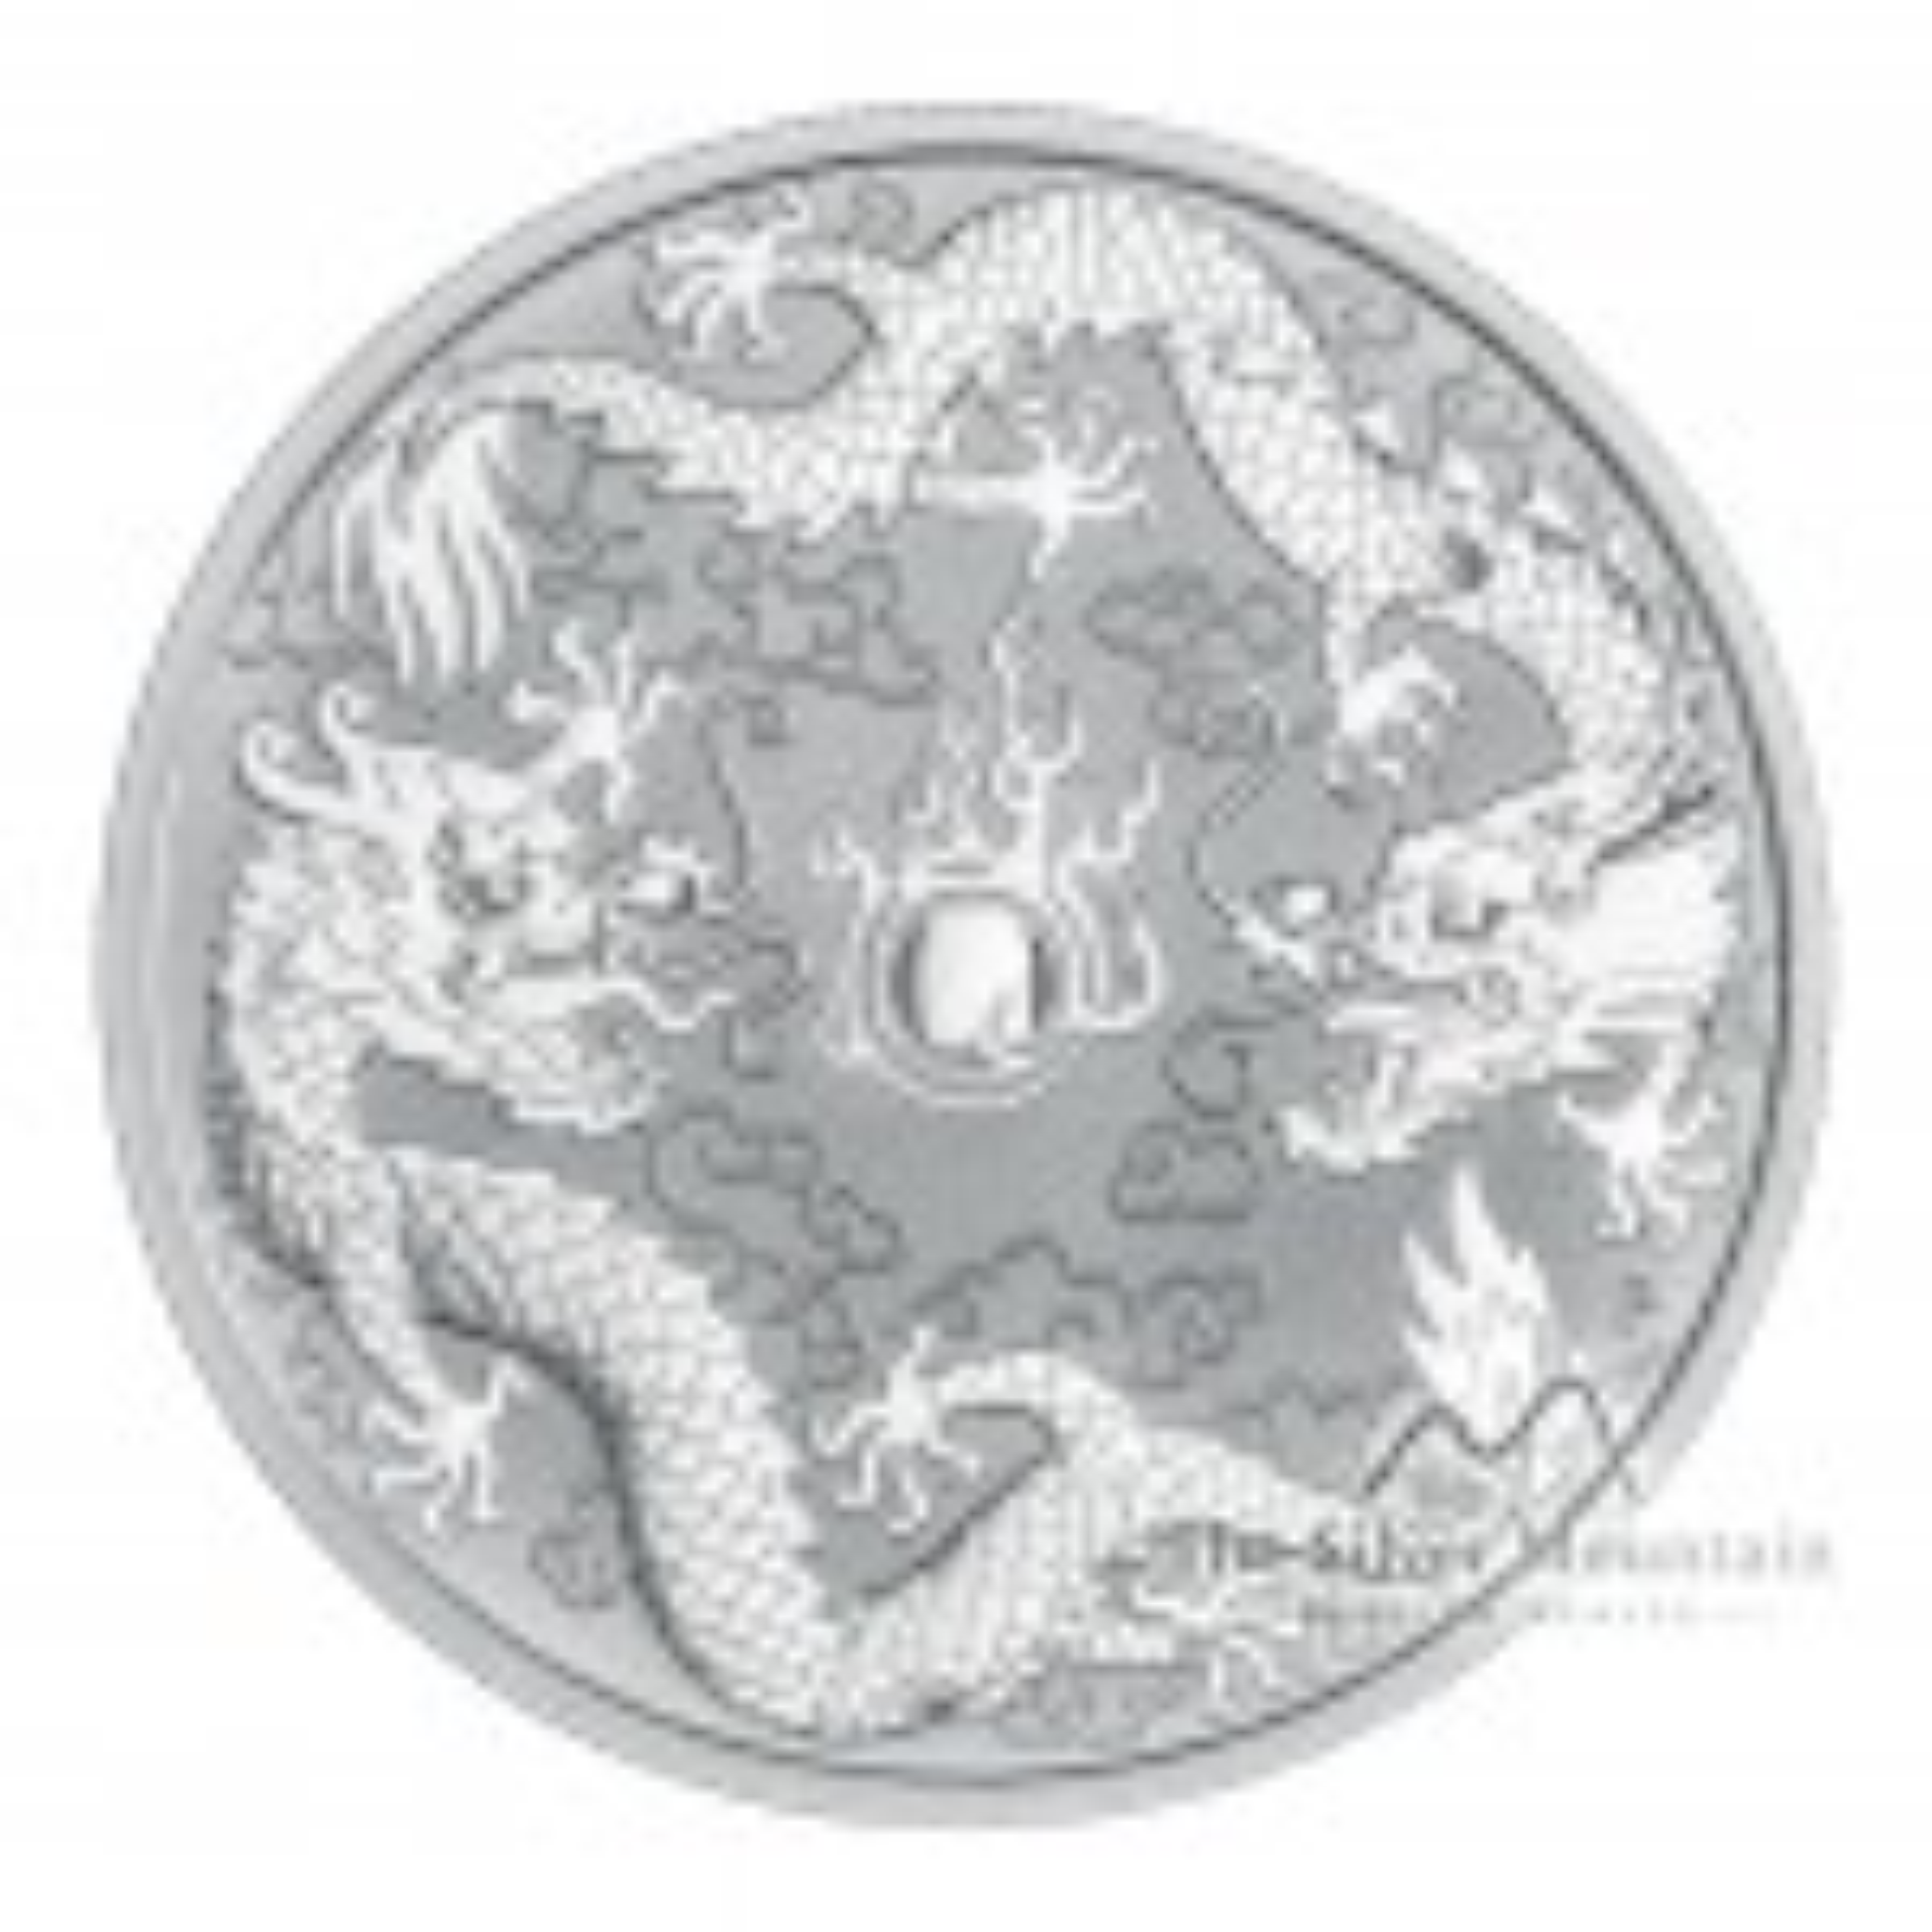 1 Troy ounce silver coin Double Dragon 2019